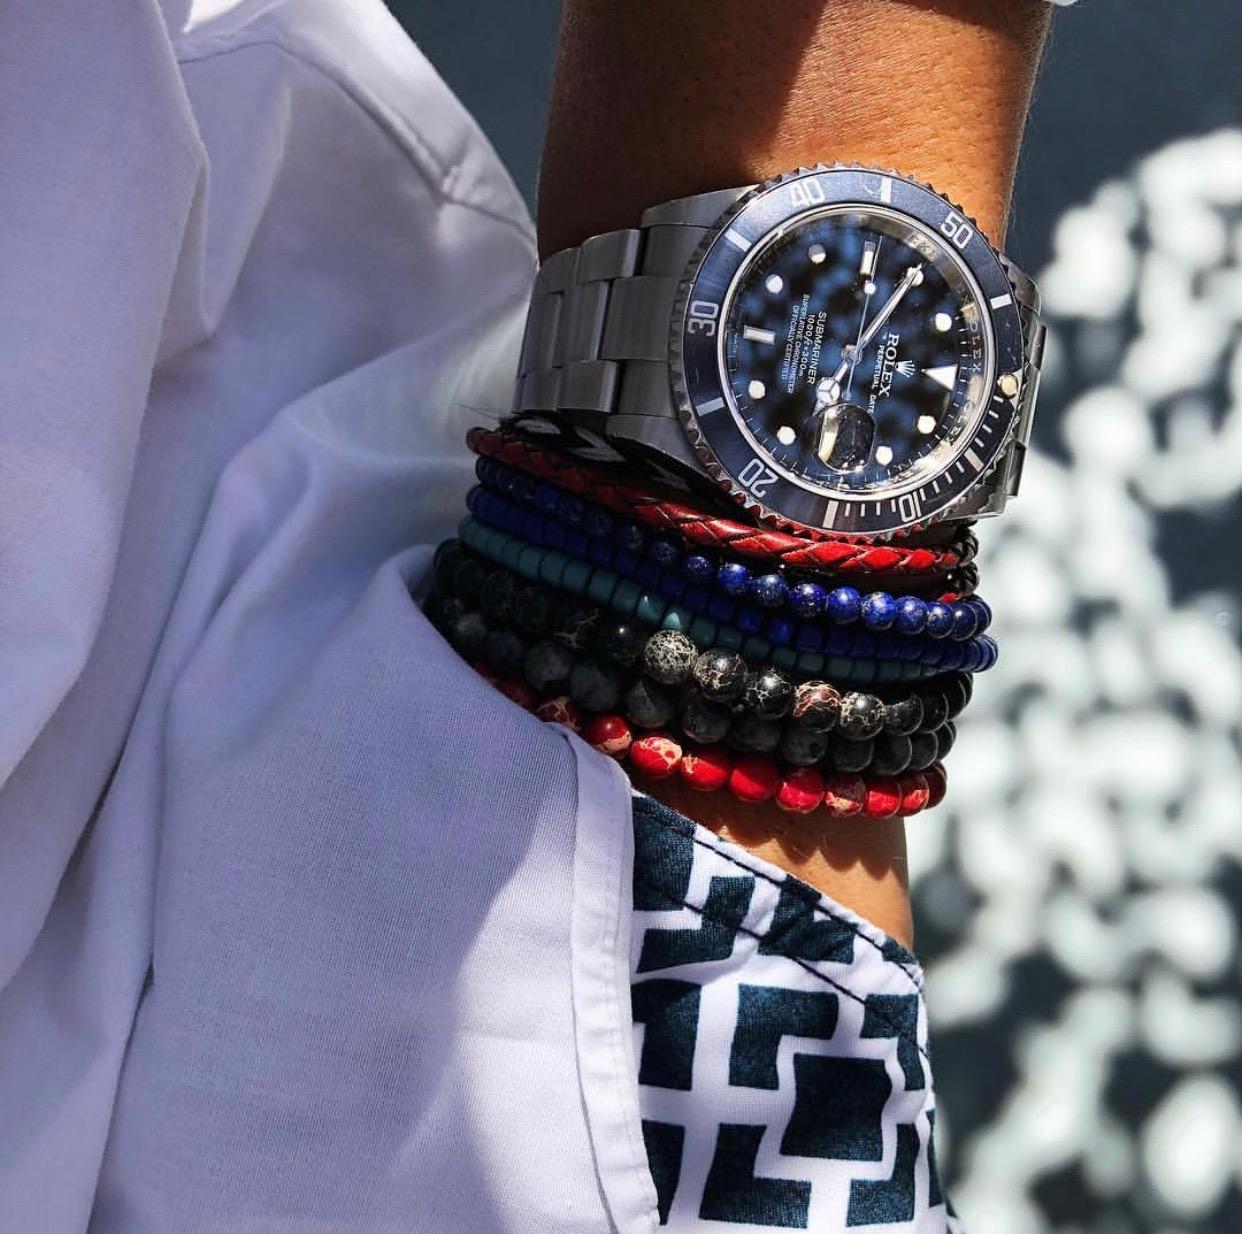 Rolex Submariner x Baxter&Baxter  Deep Blue 4mm ,  Red Sea 6mm  &  Black Sea 6mm Bracelets